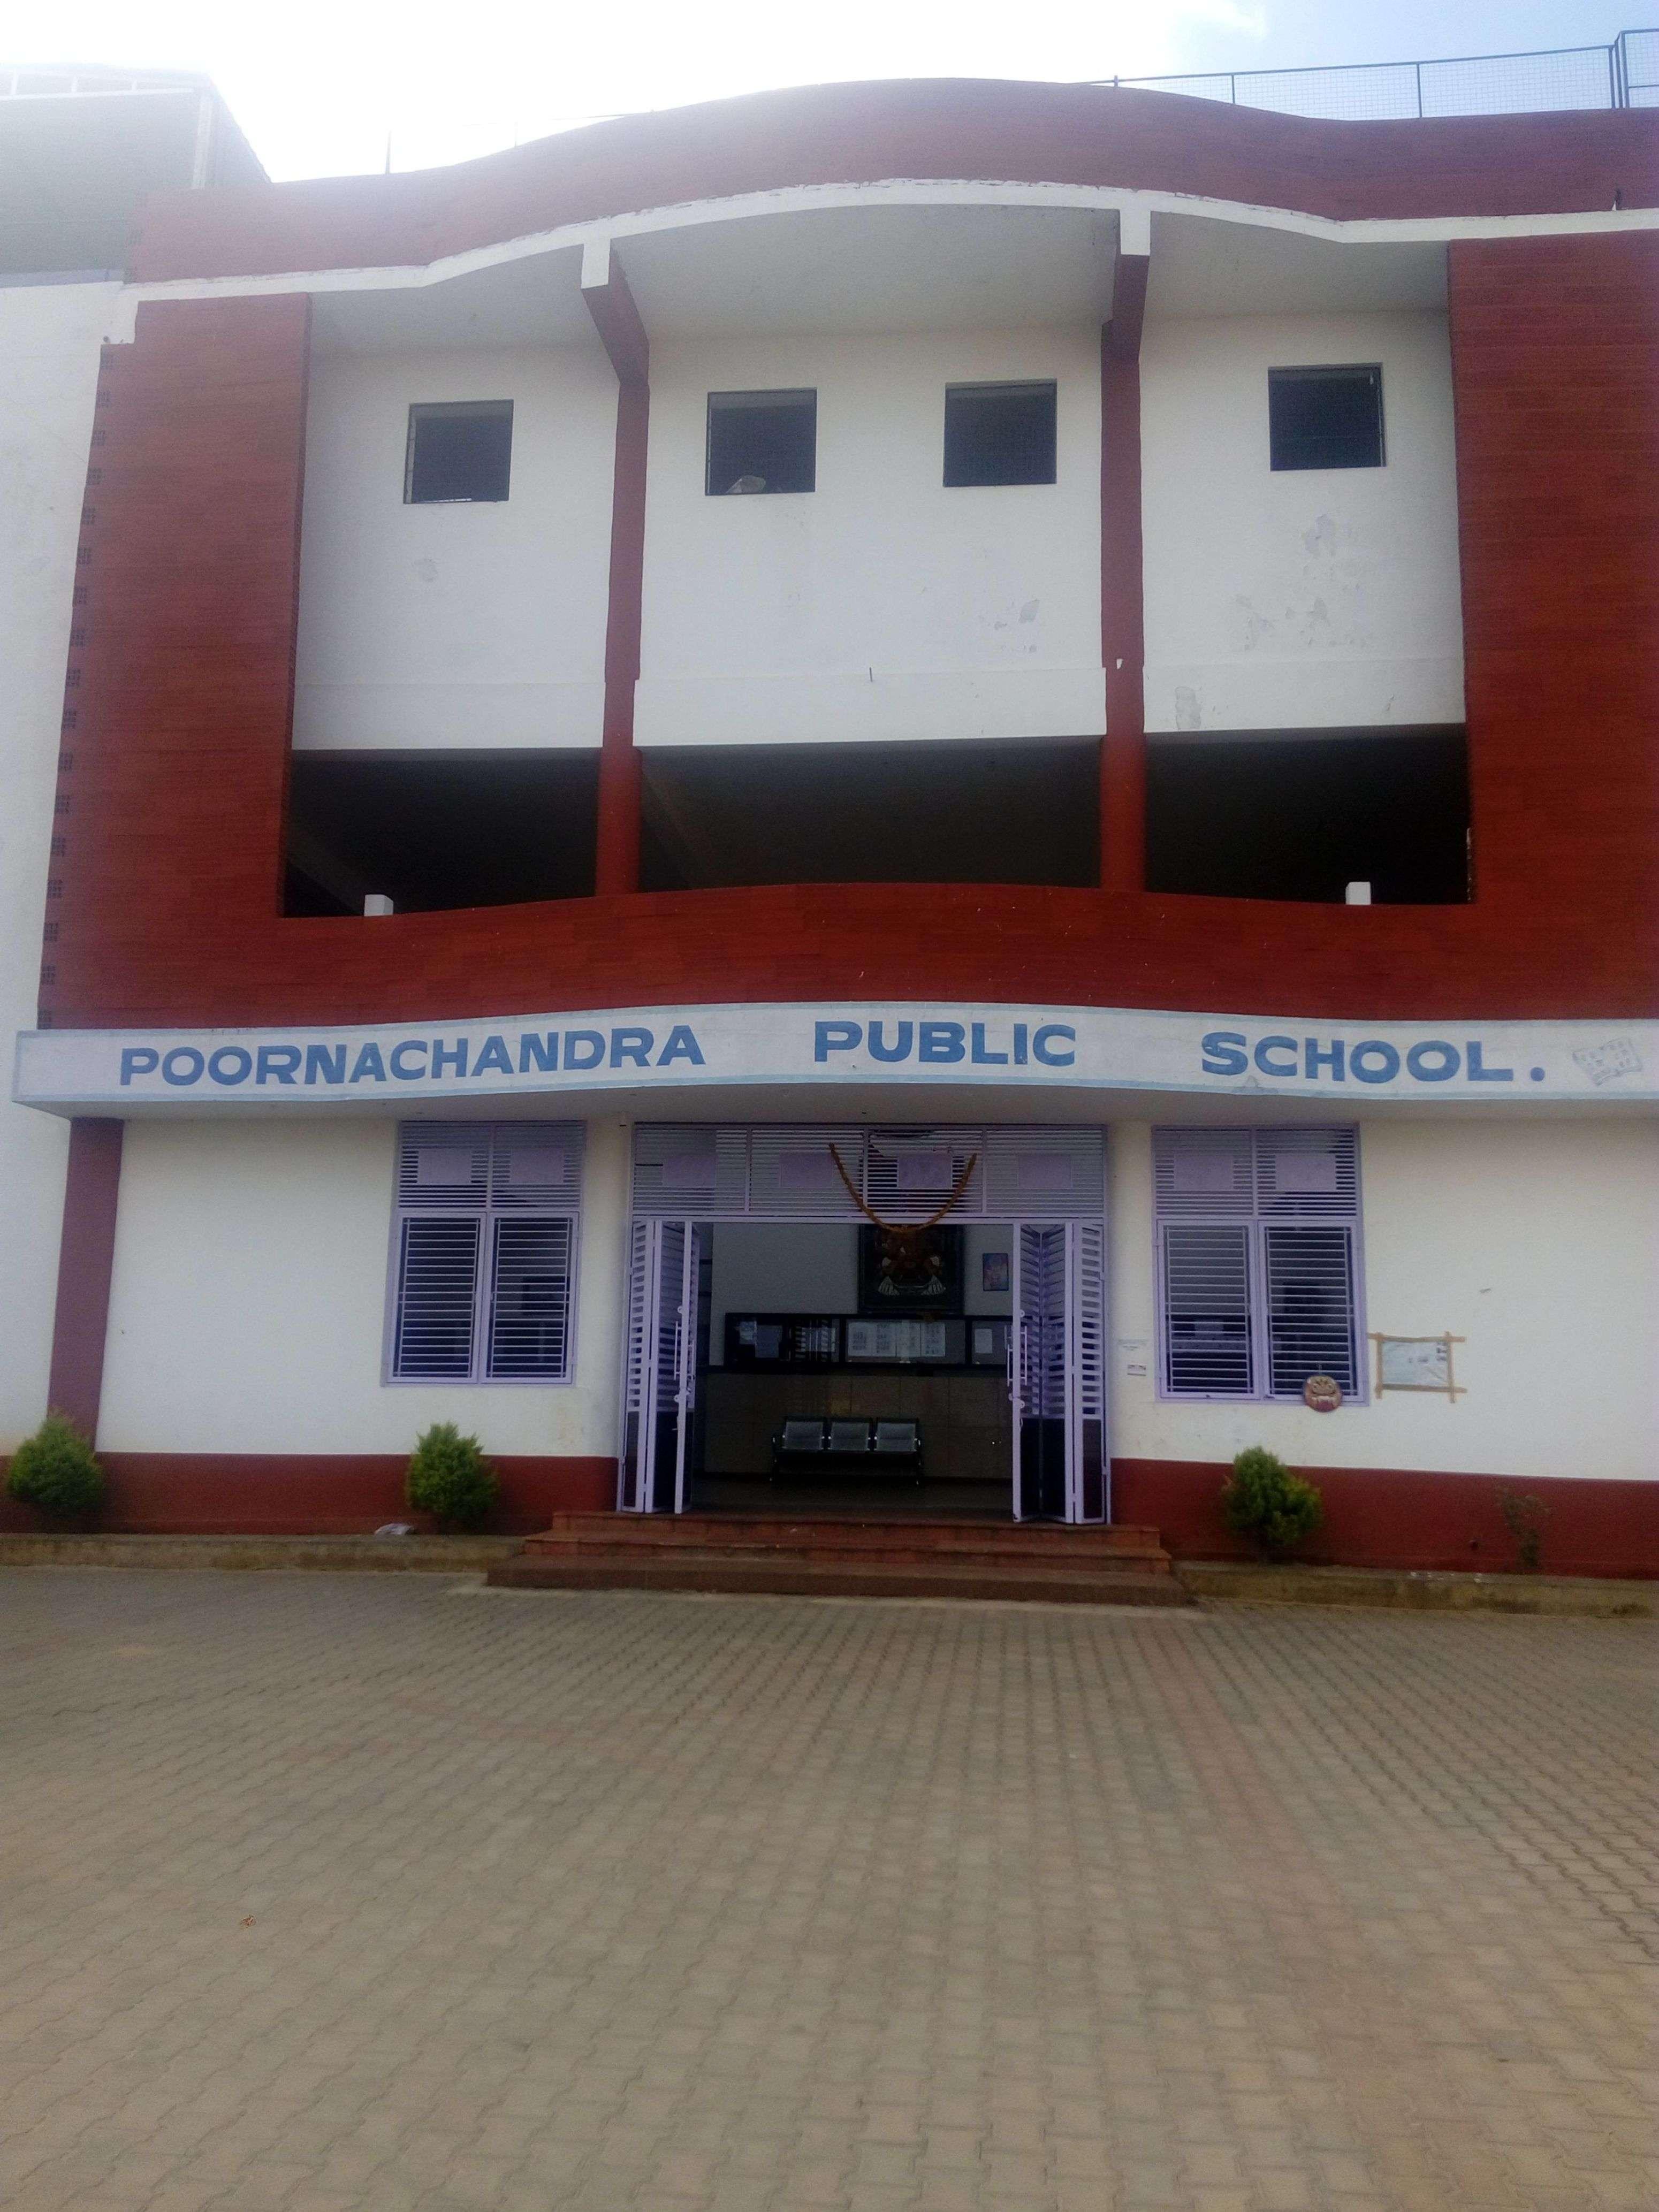 POORNACHANDRA PUBLIC SCHOOL KUVEMPU NAGAR CHANNARAYAPATNA 830352